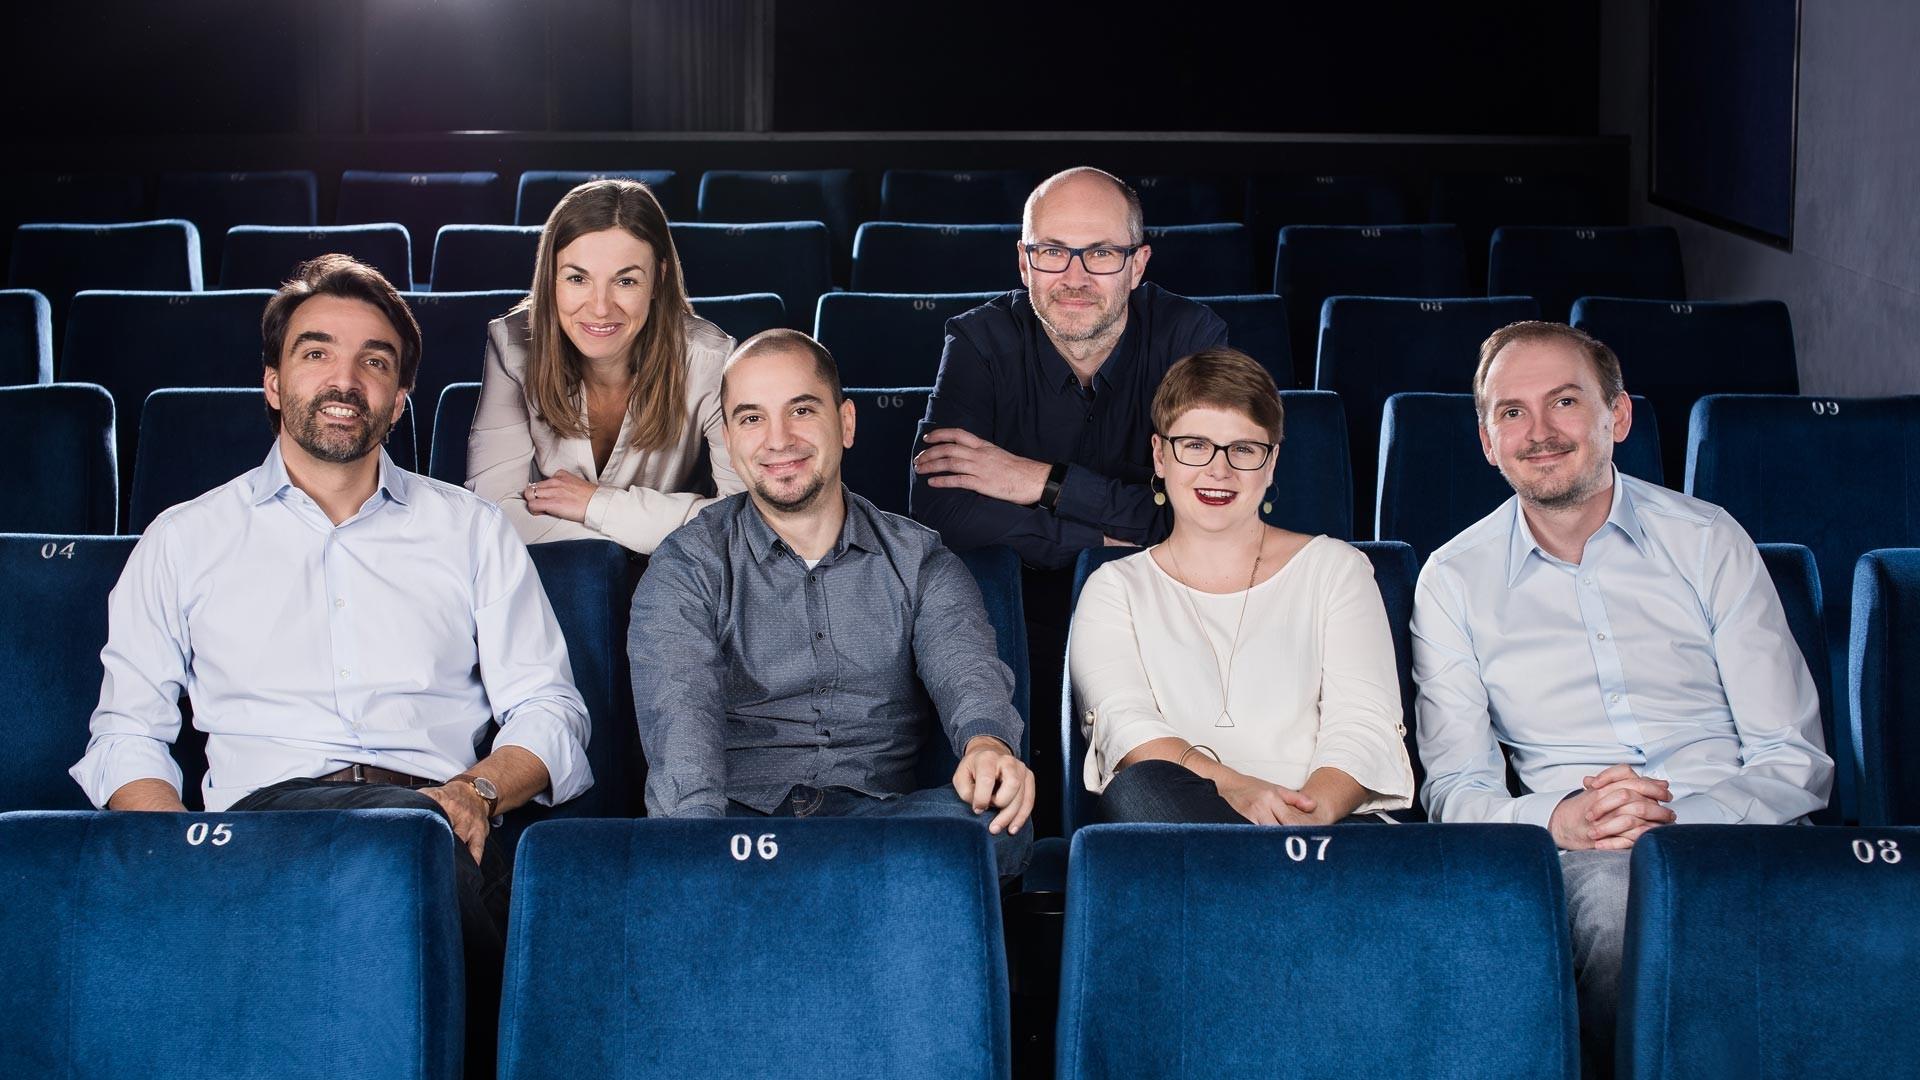 Teamfoto-Gemeindeserver-igap-pundr-Kino.jpg